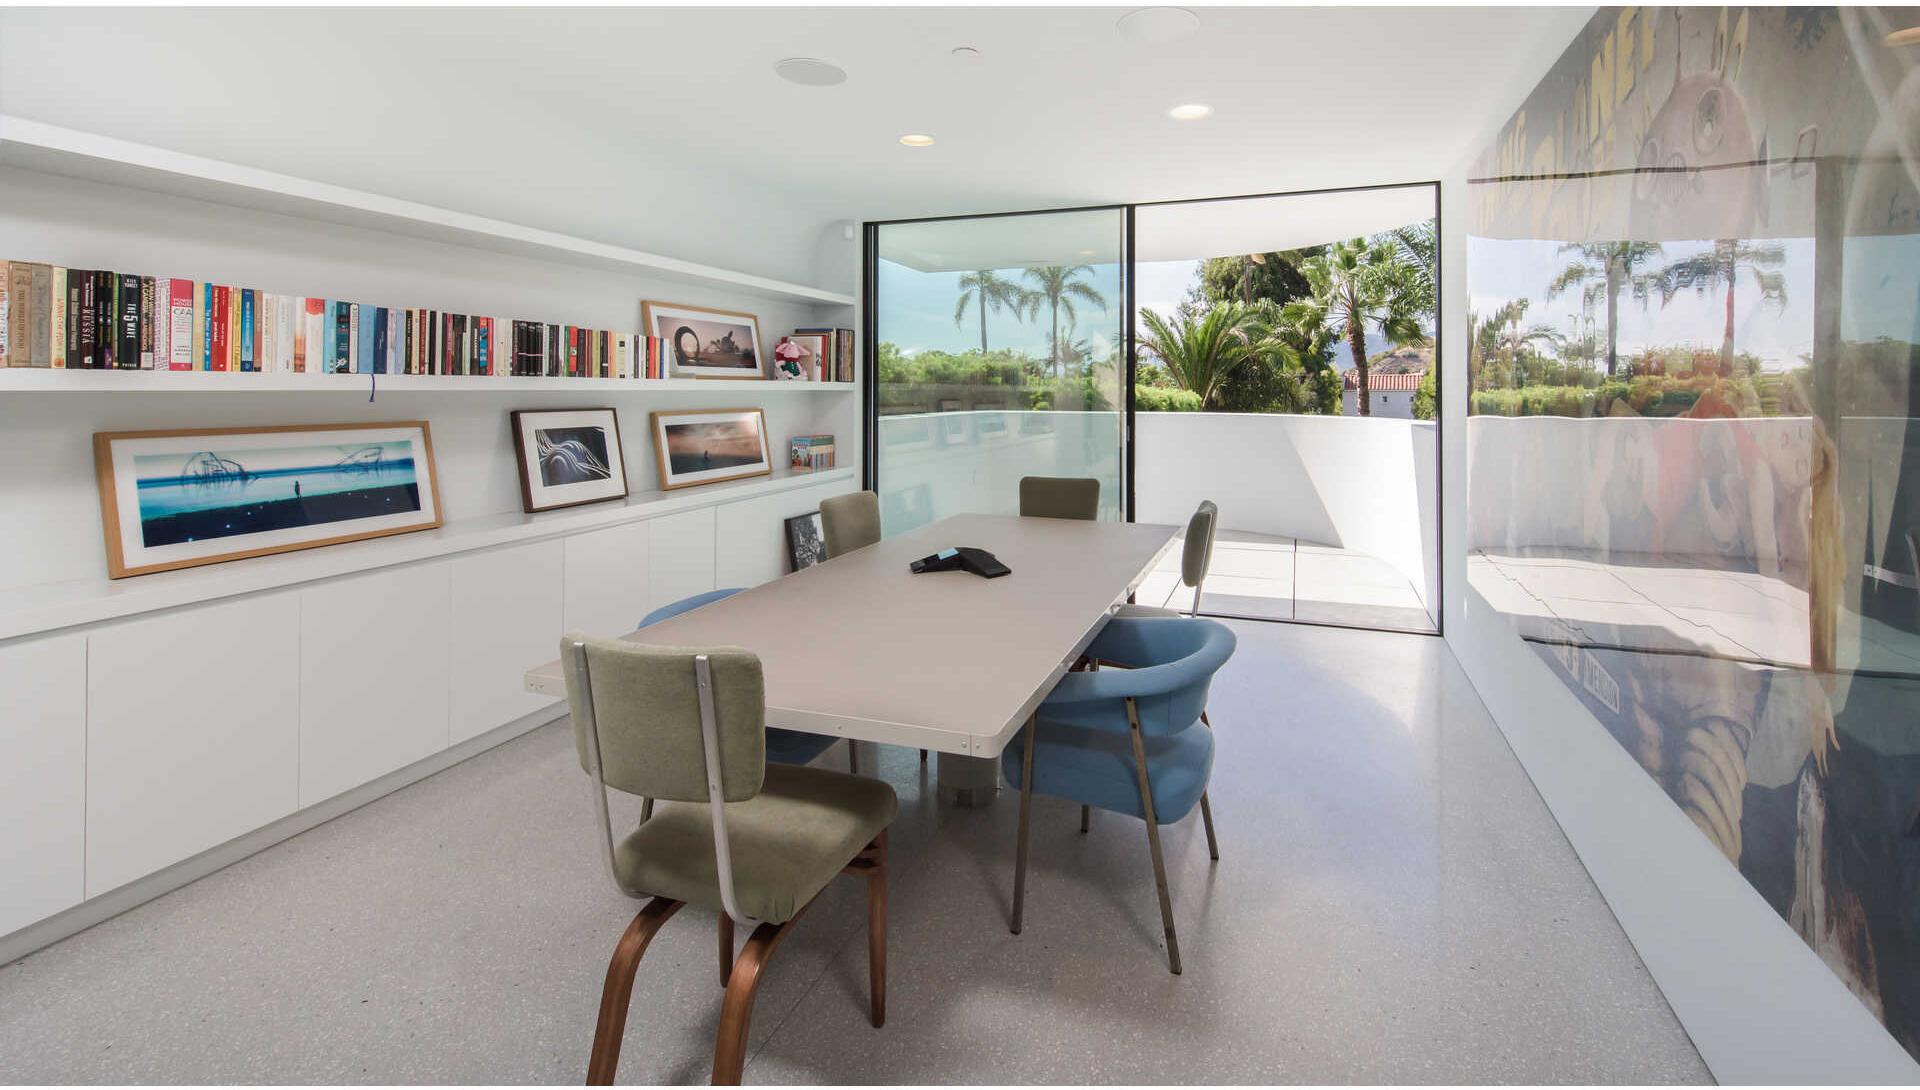 Richard Neutral's refurbished Sten-Frenke House lists for $15m